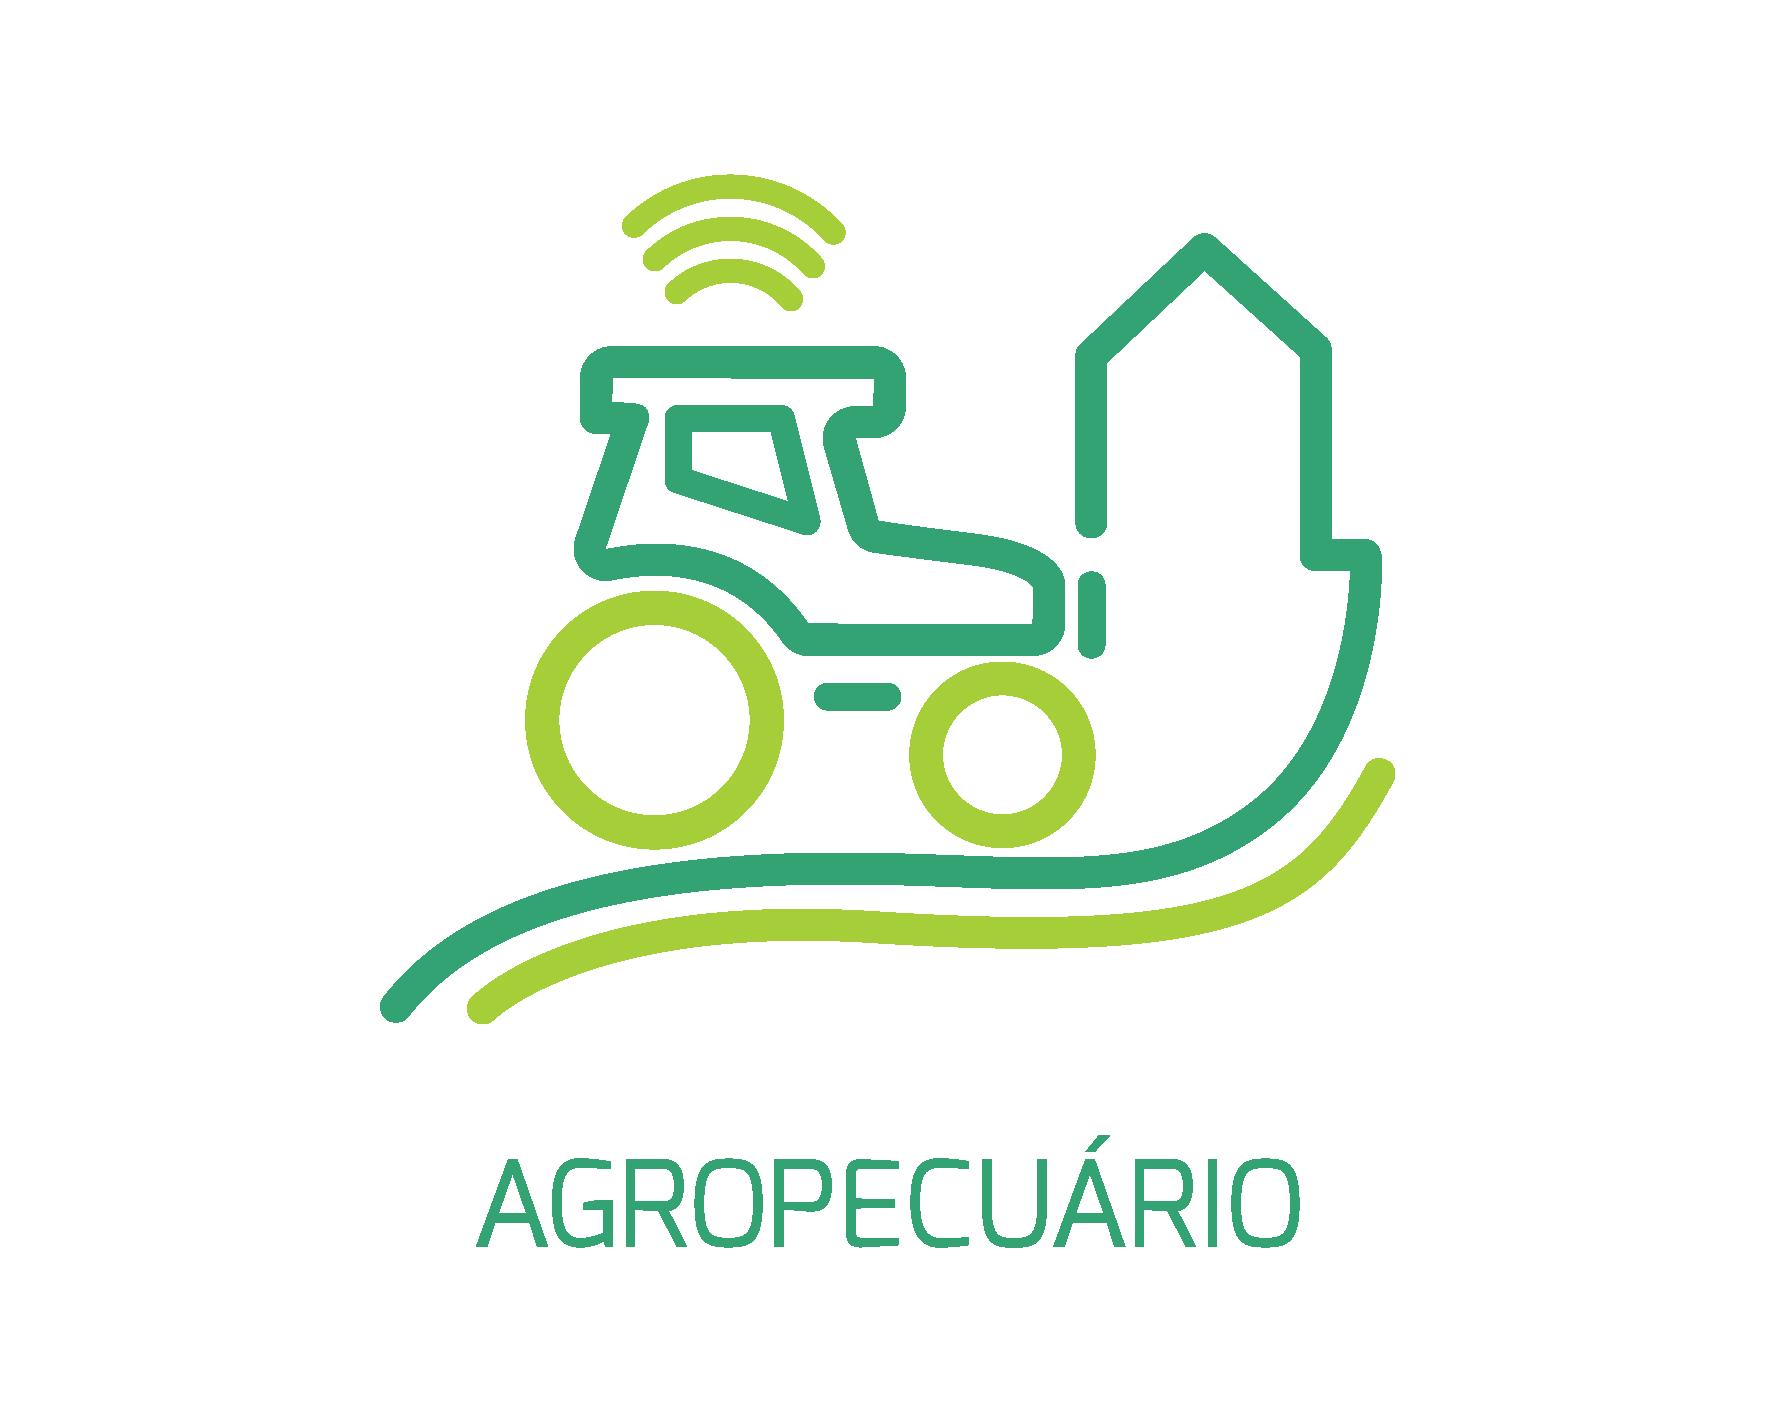 agropecuario 03 04 2020